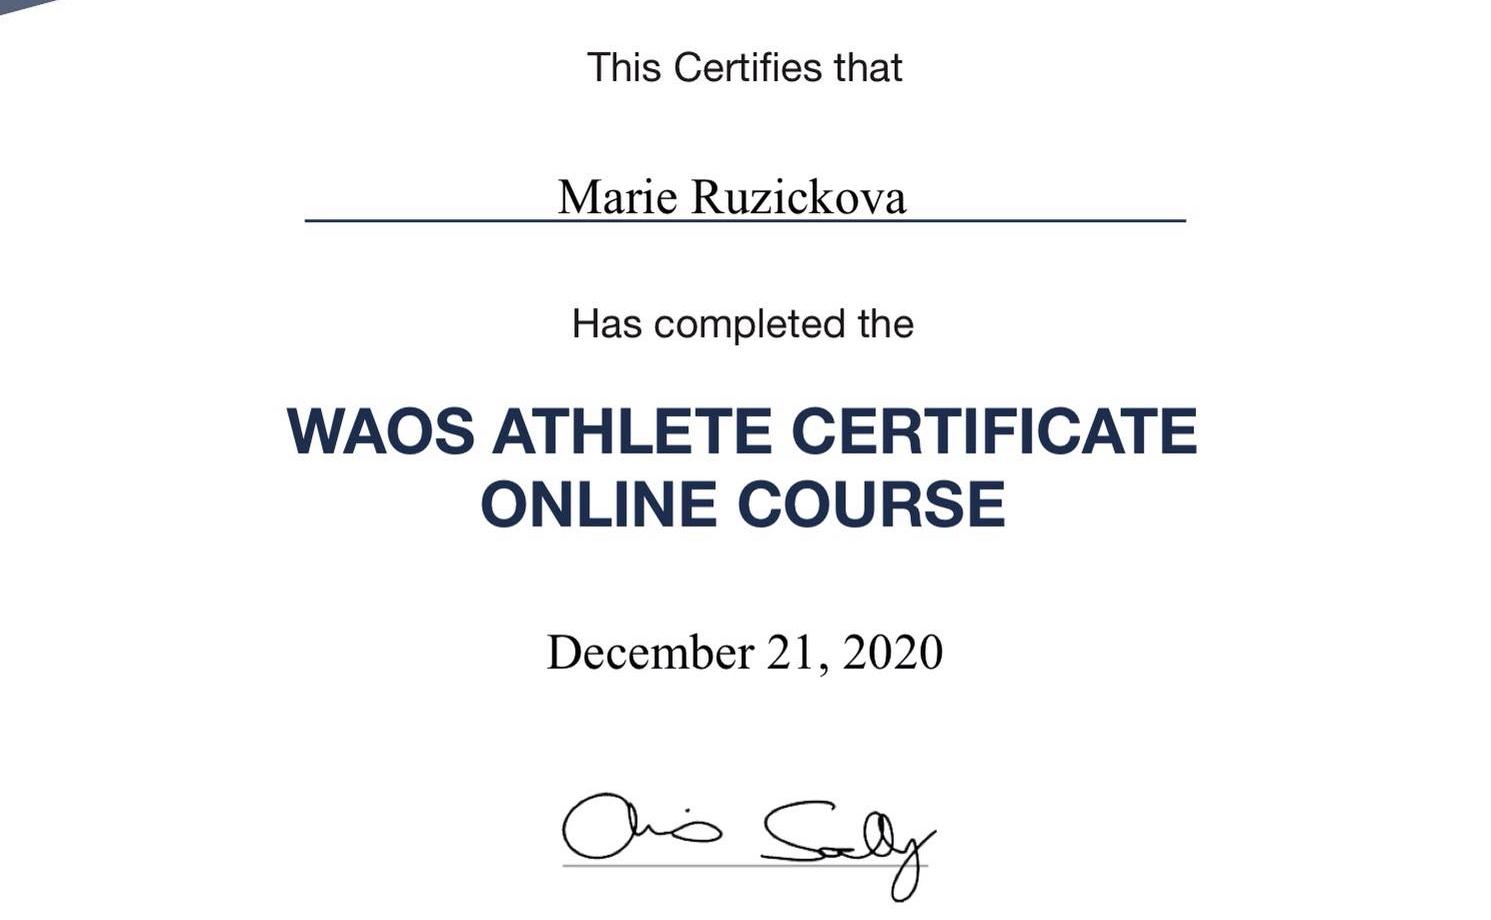 Marie získala certifikát WAoS